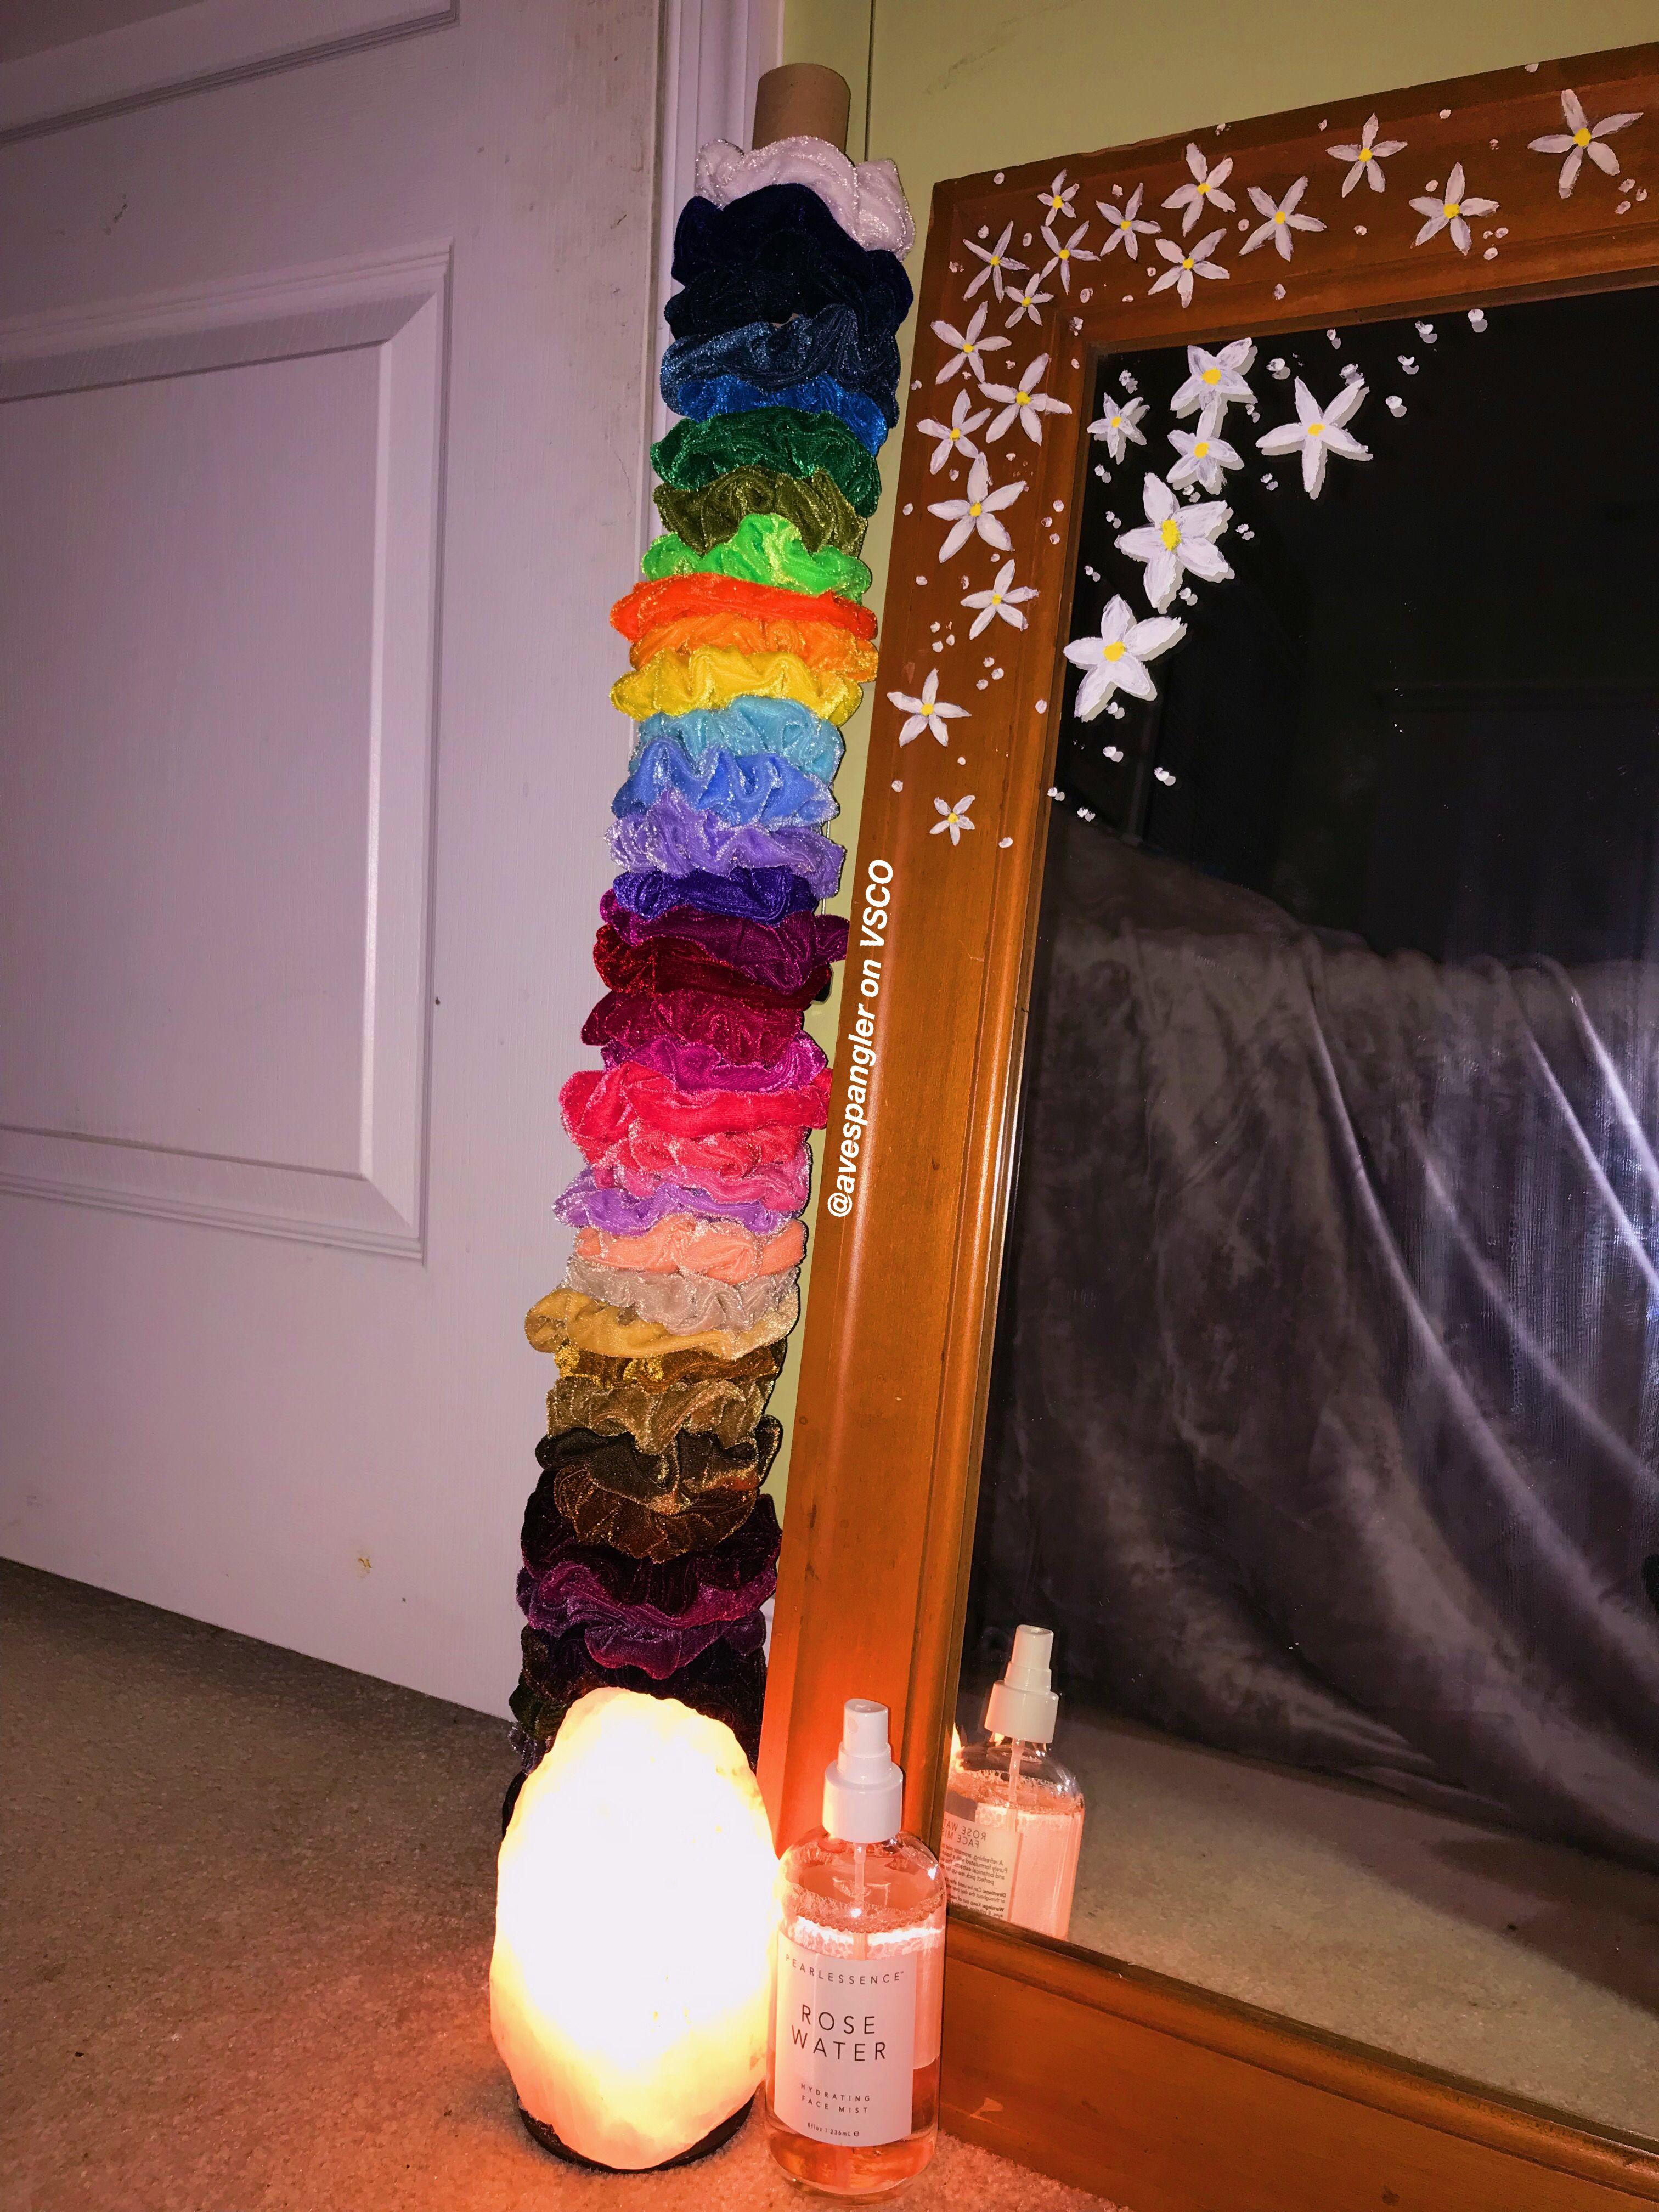 Scrunchies Painted Mirror Aesthetic Vsco Pearlessence Rose Water Salt Lamp Painted Flowers Avespangler On Pinter Mirror Painting Room Decor Room Decor Bedroom